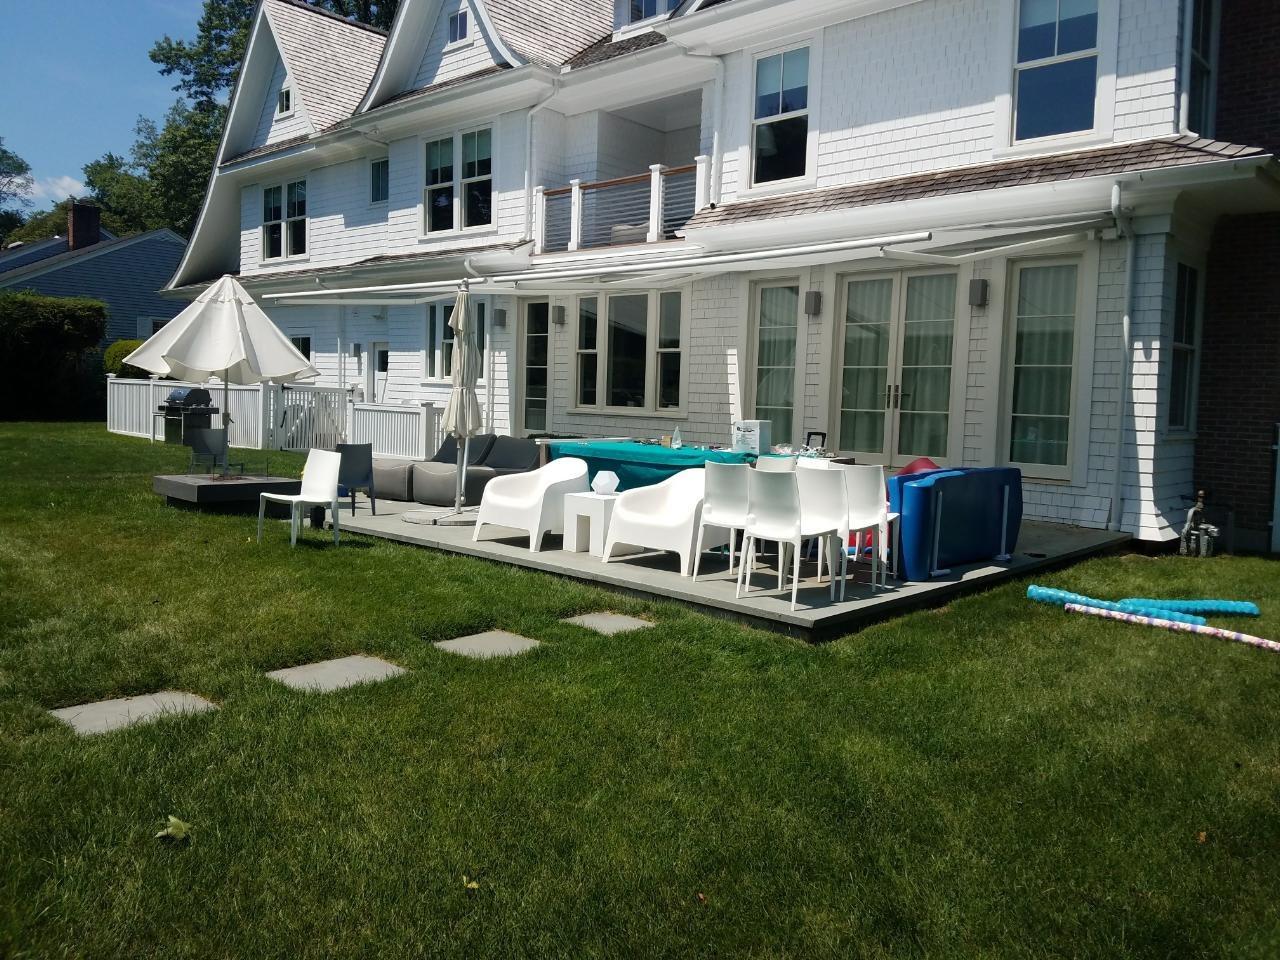 Corradi SVET Retractable Awning Installed In New Britain ...